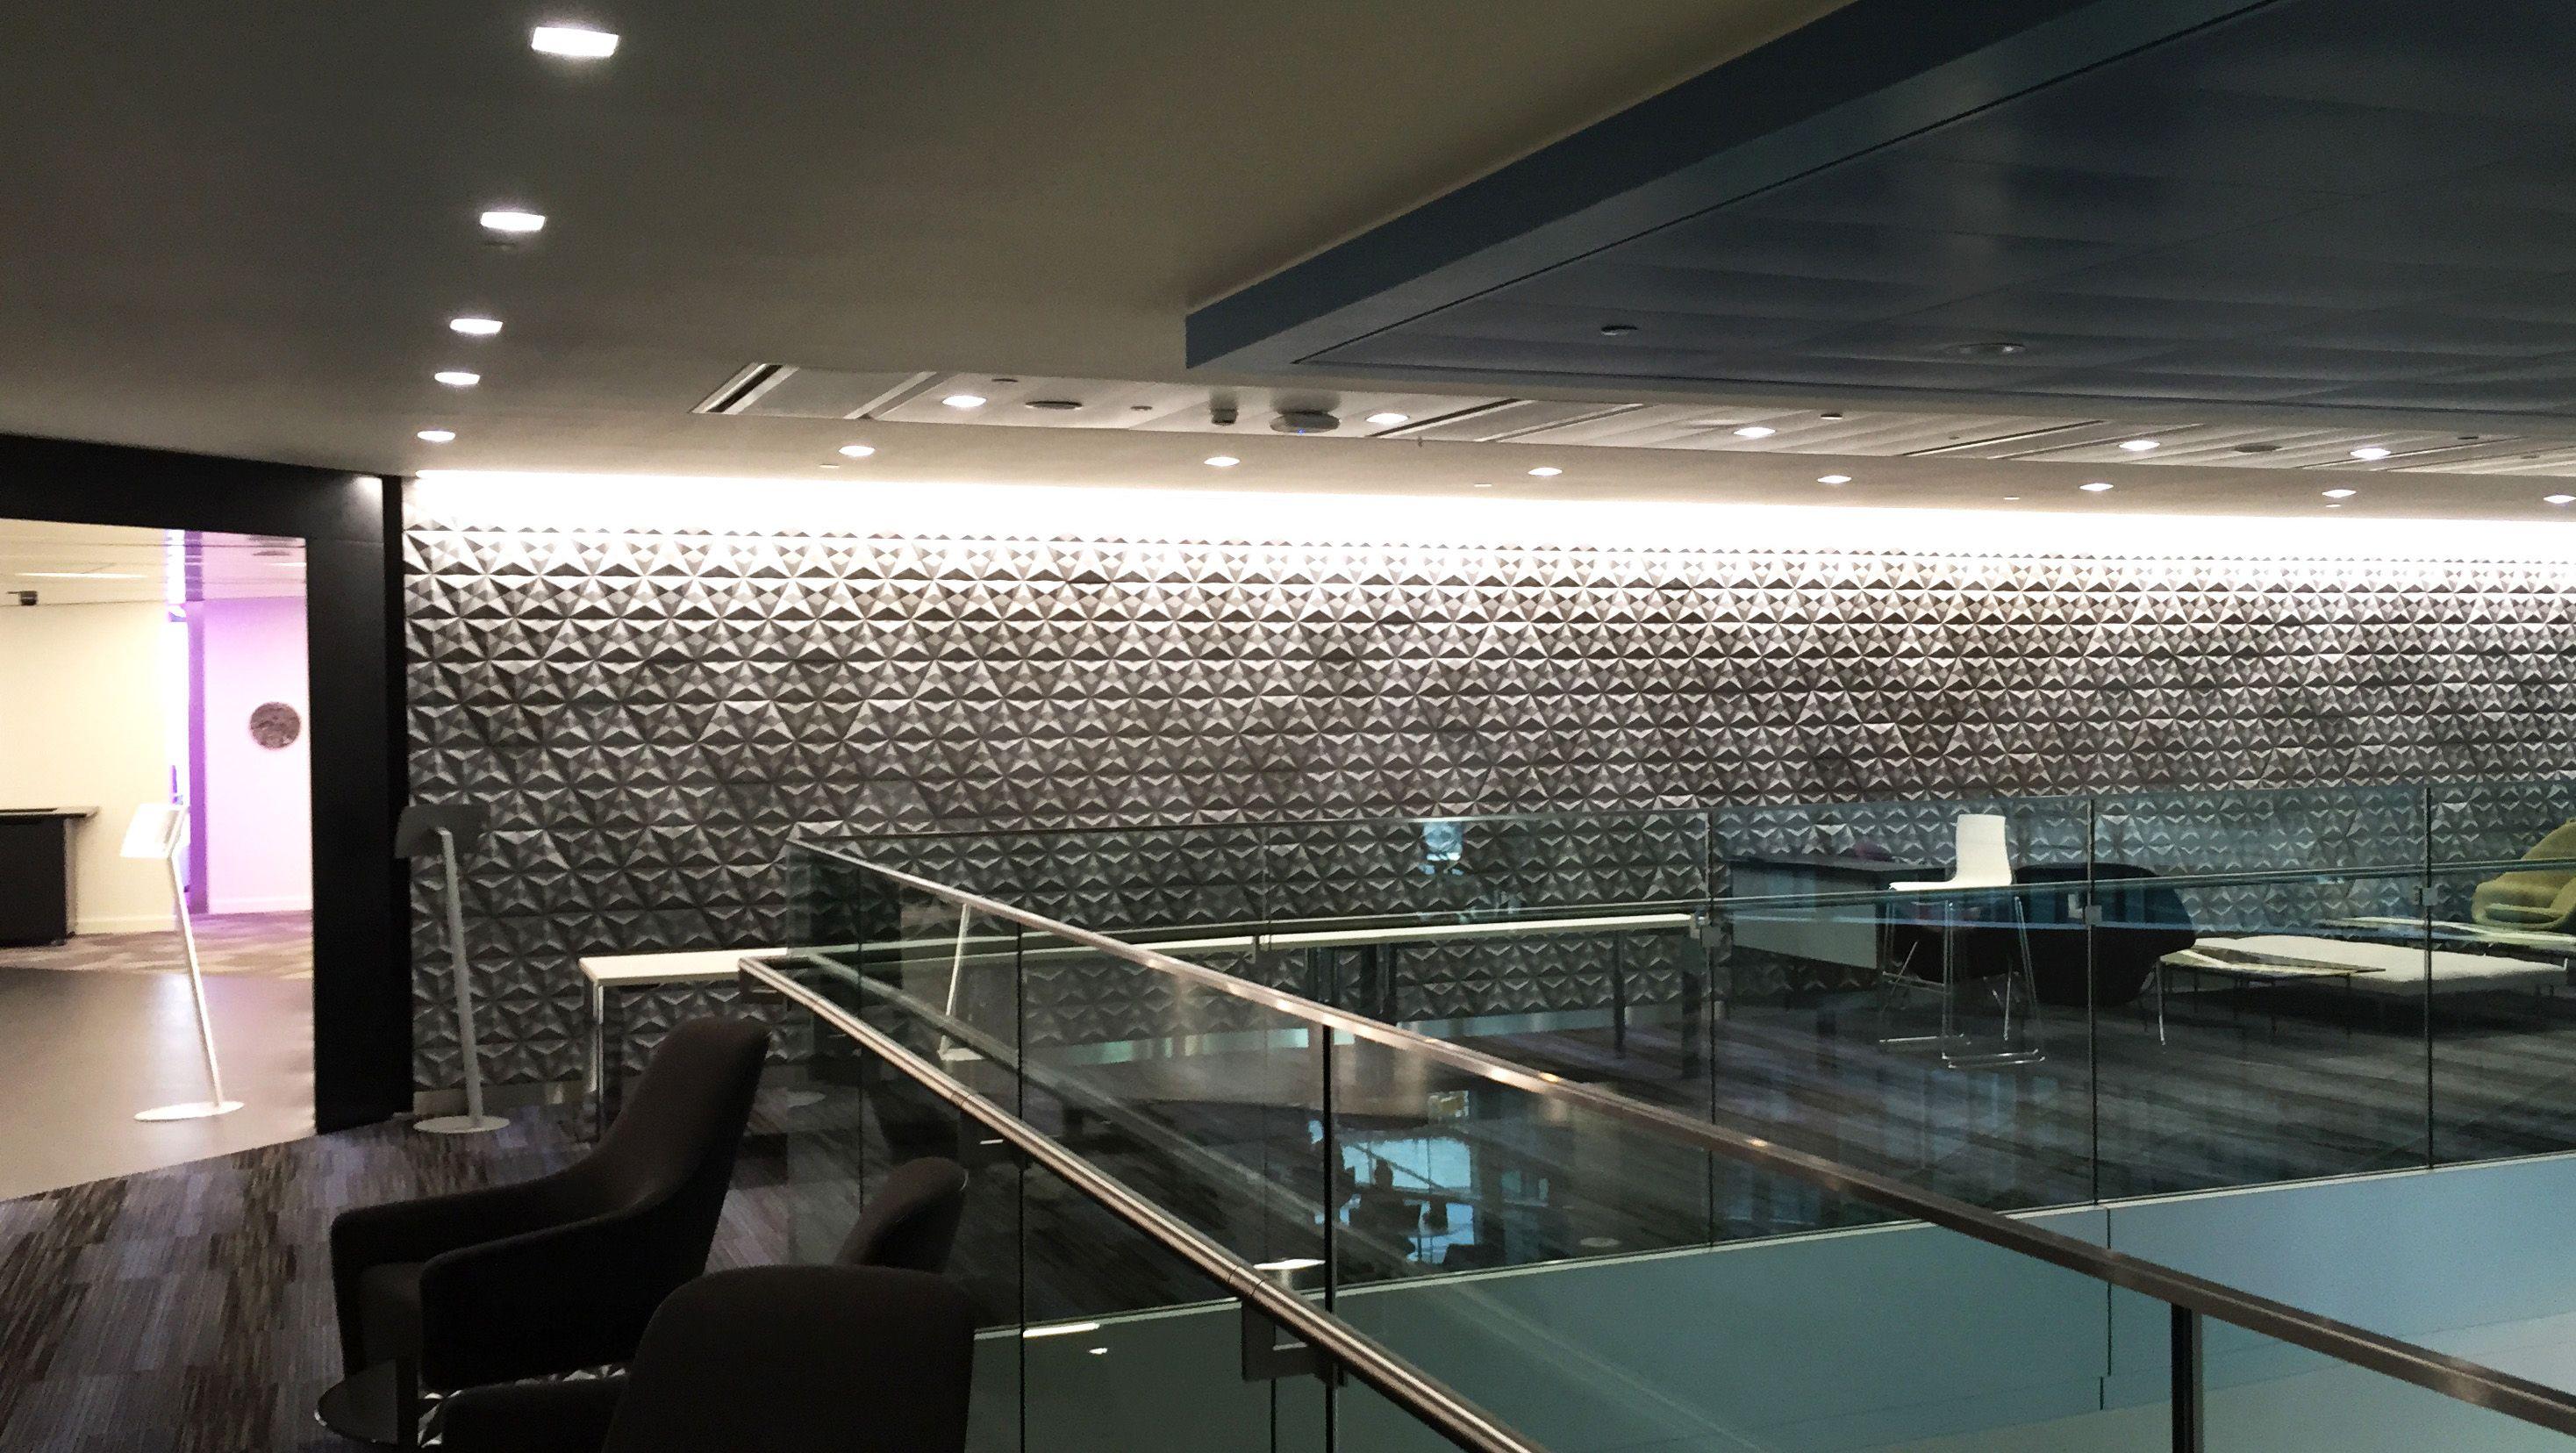 Tre concrete tile design by levi fignar i kaza concrete tre concrete tile design by levi fignar i kaza concrete surfacedesign featurewall doublecrazyfo Choice Image